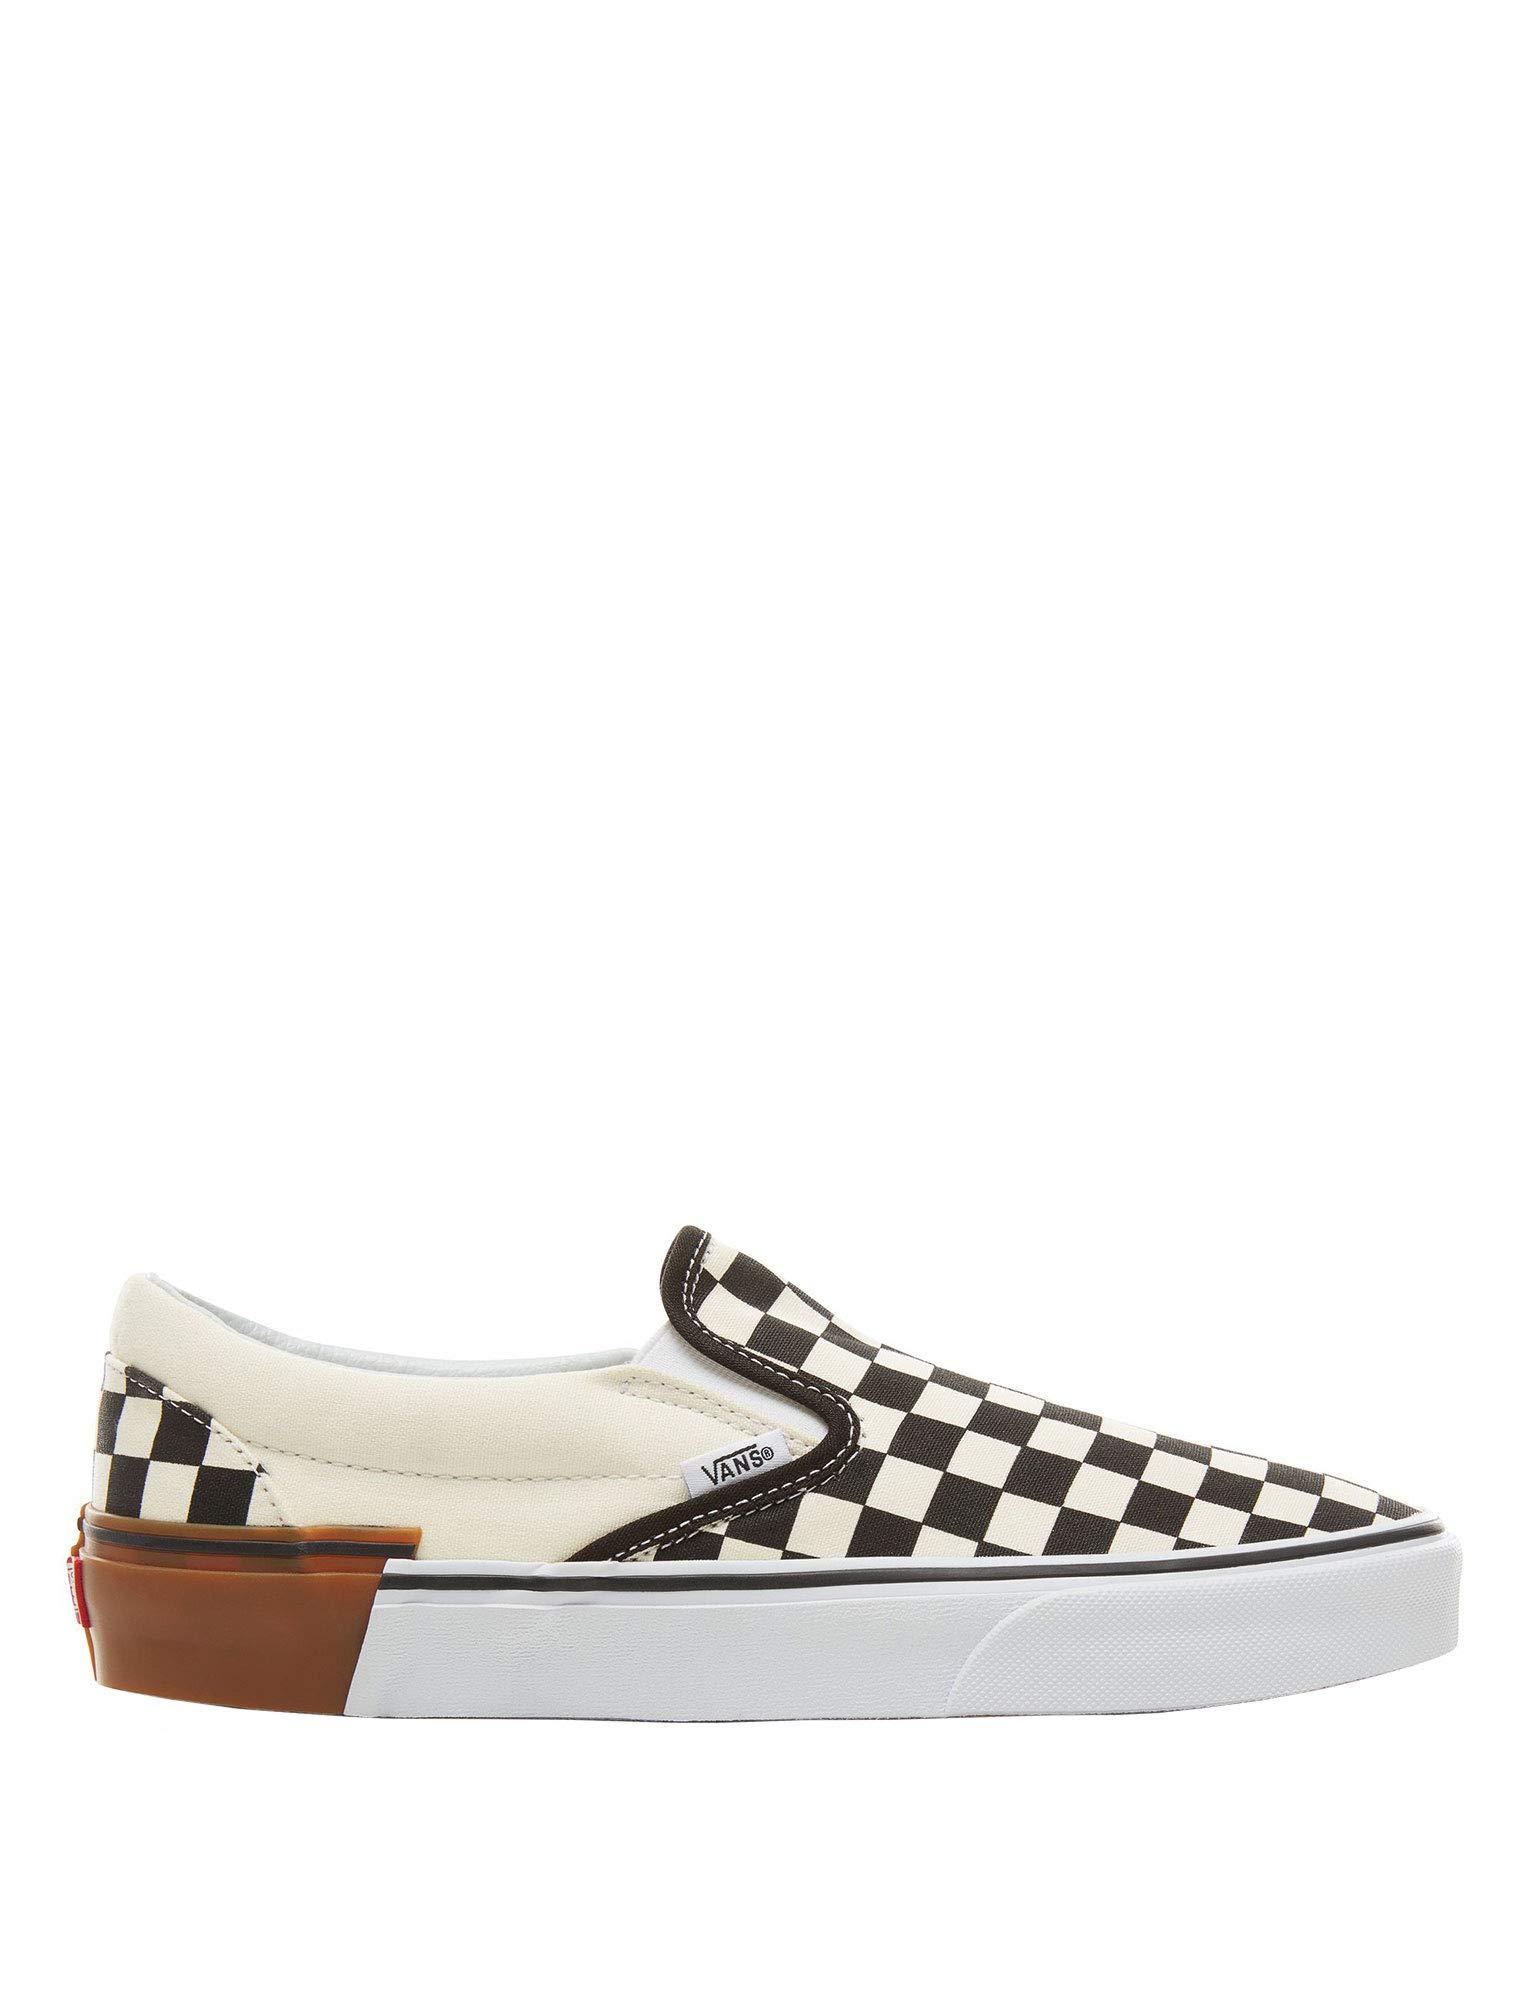 86af4942 Vans Classic Slip On Gum Block Checkerboard Men's Classic Skate Shoes Size  9.5